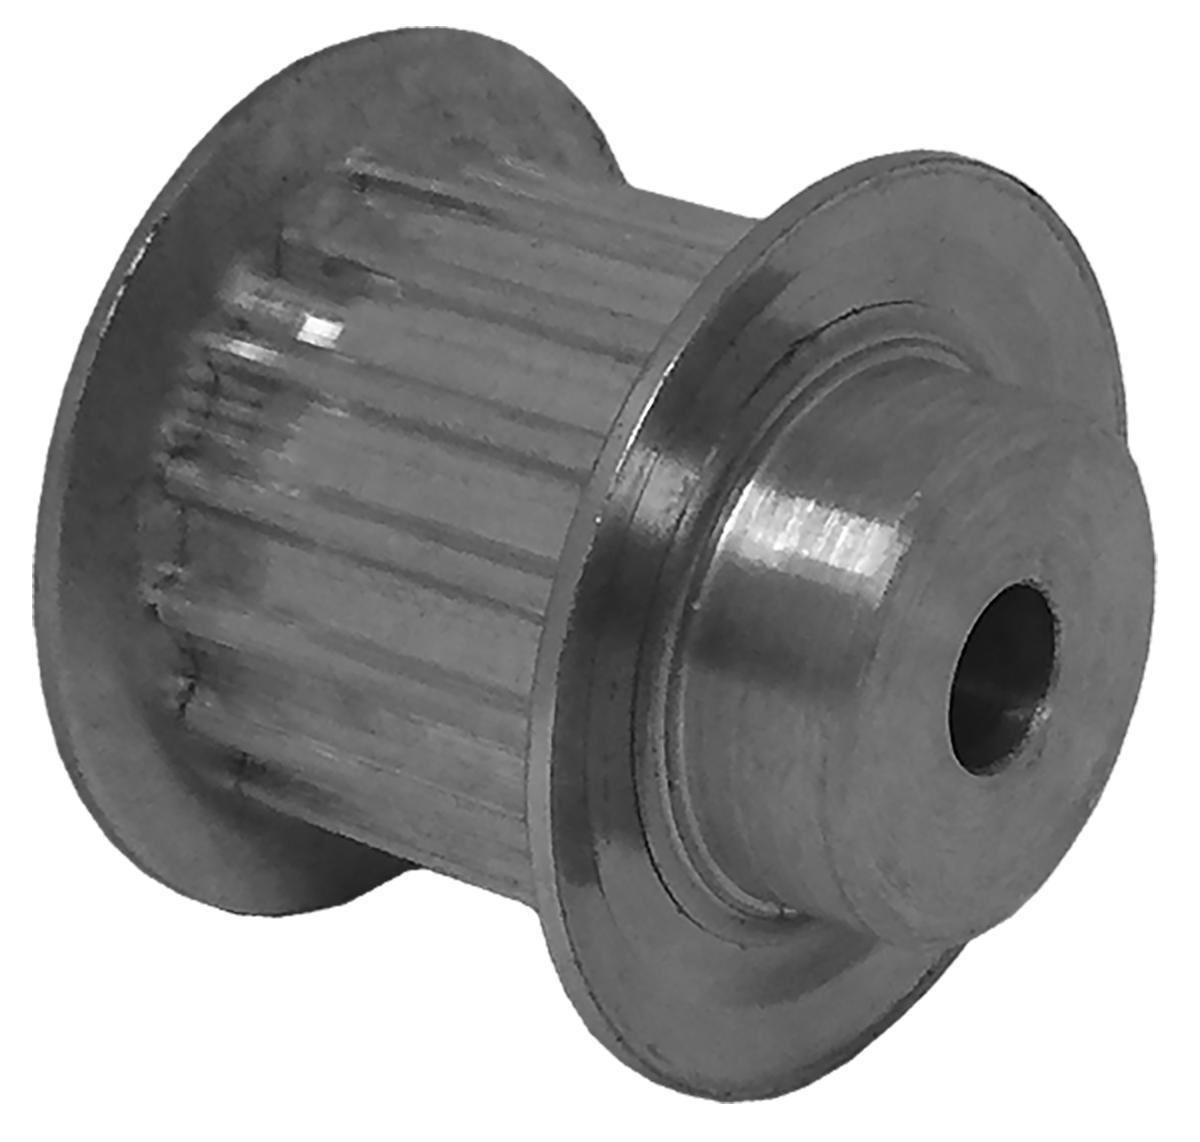 27AT5/16-2 - Aluminum Metric Pulleys